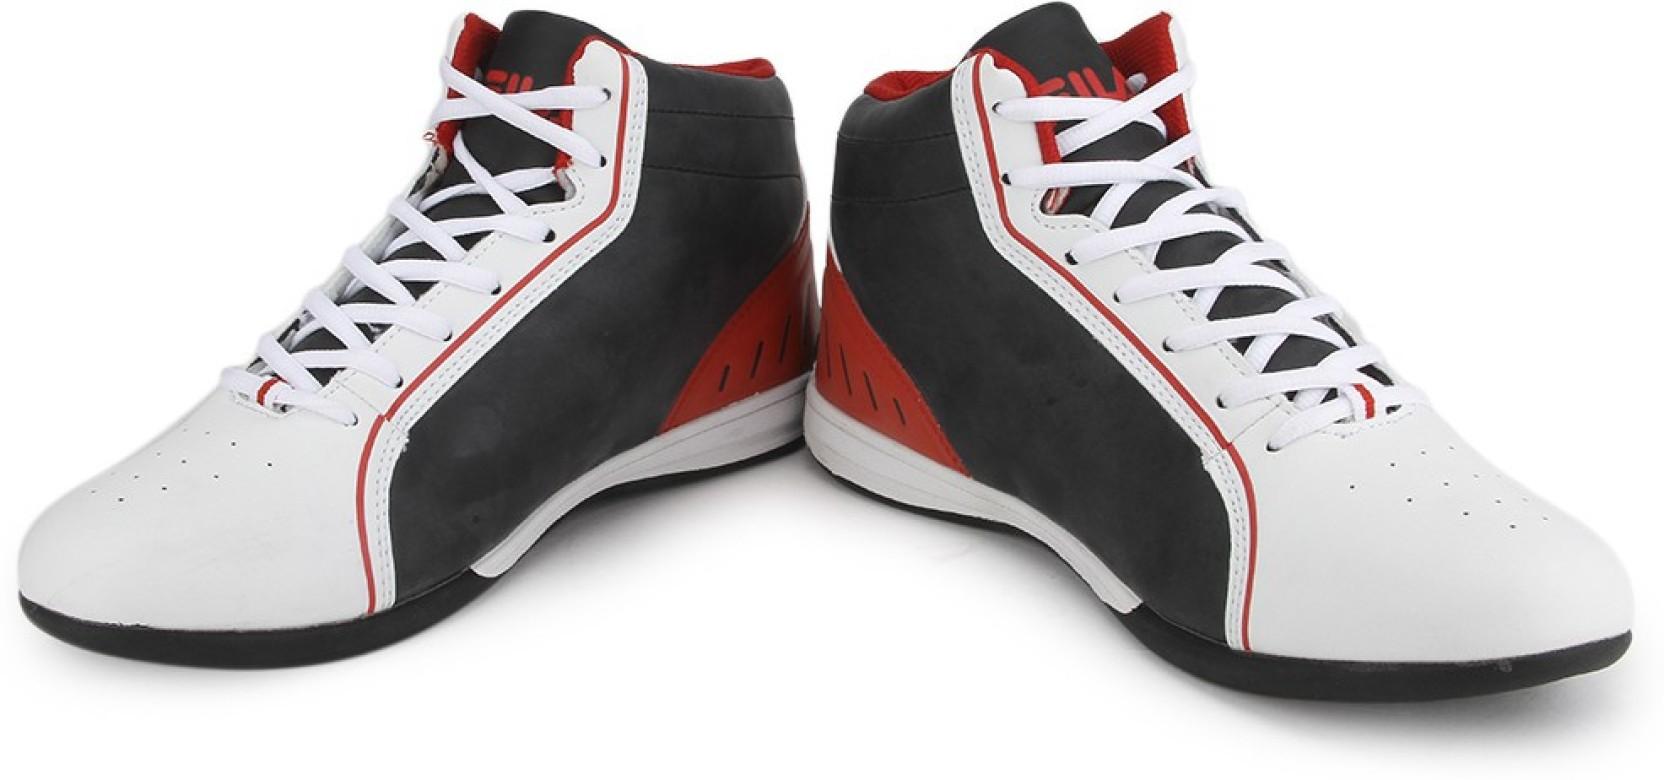 eb822b022ebd Fila ISONZO Sneakers For Men - Buy WHT BLK Color Fila ISONZO ...